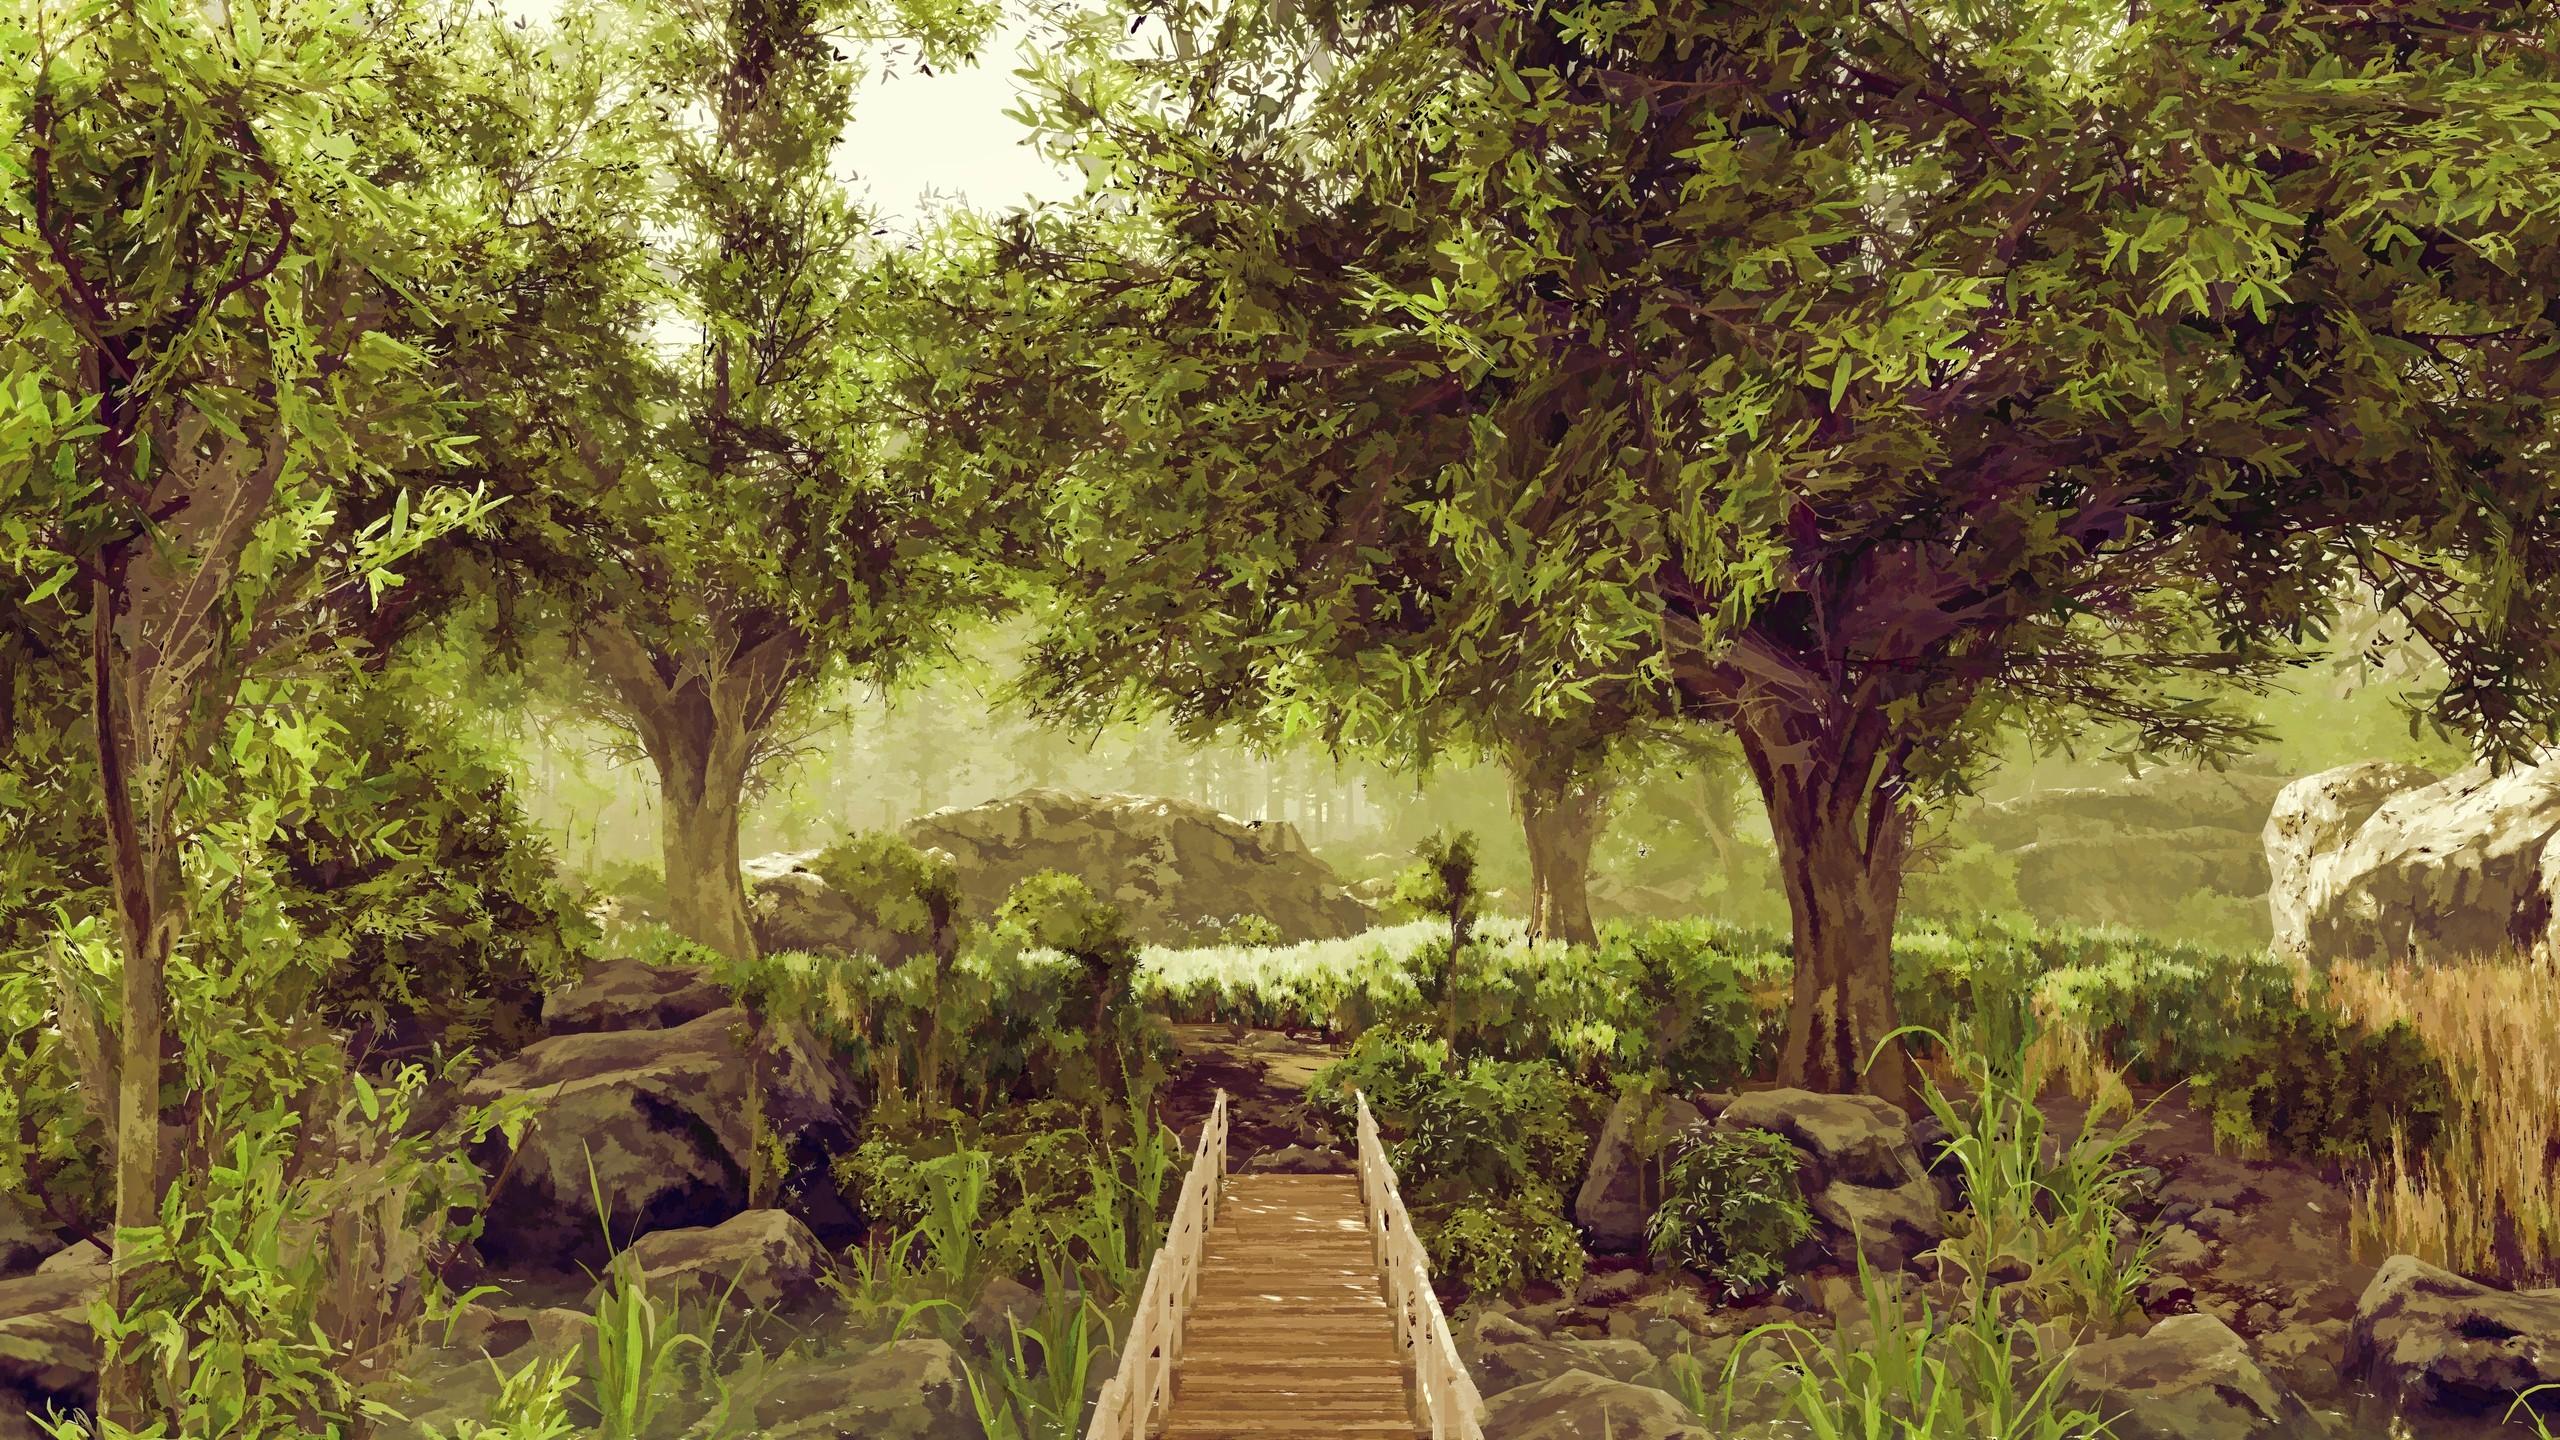 Wallpaper : landscape, forest, garden, nature, artwork, jungle ...